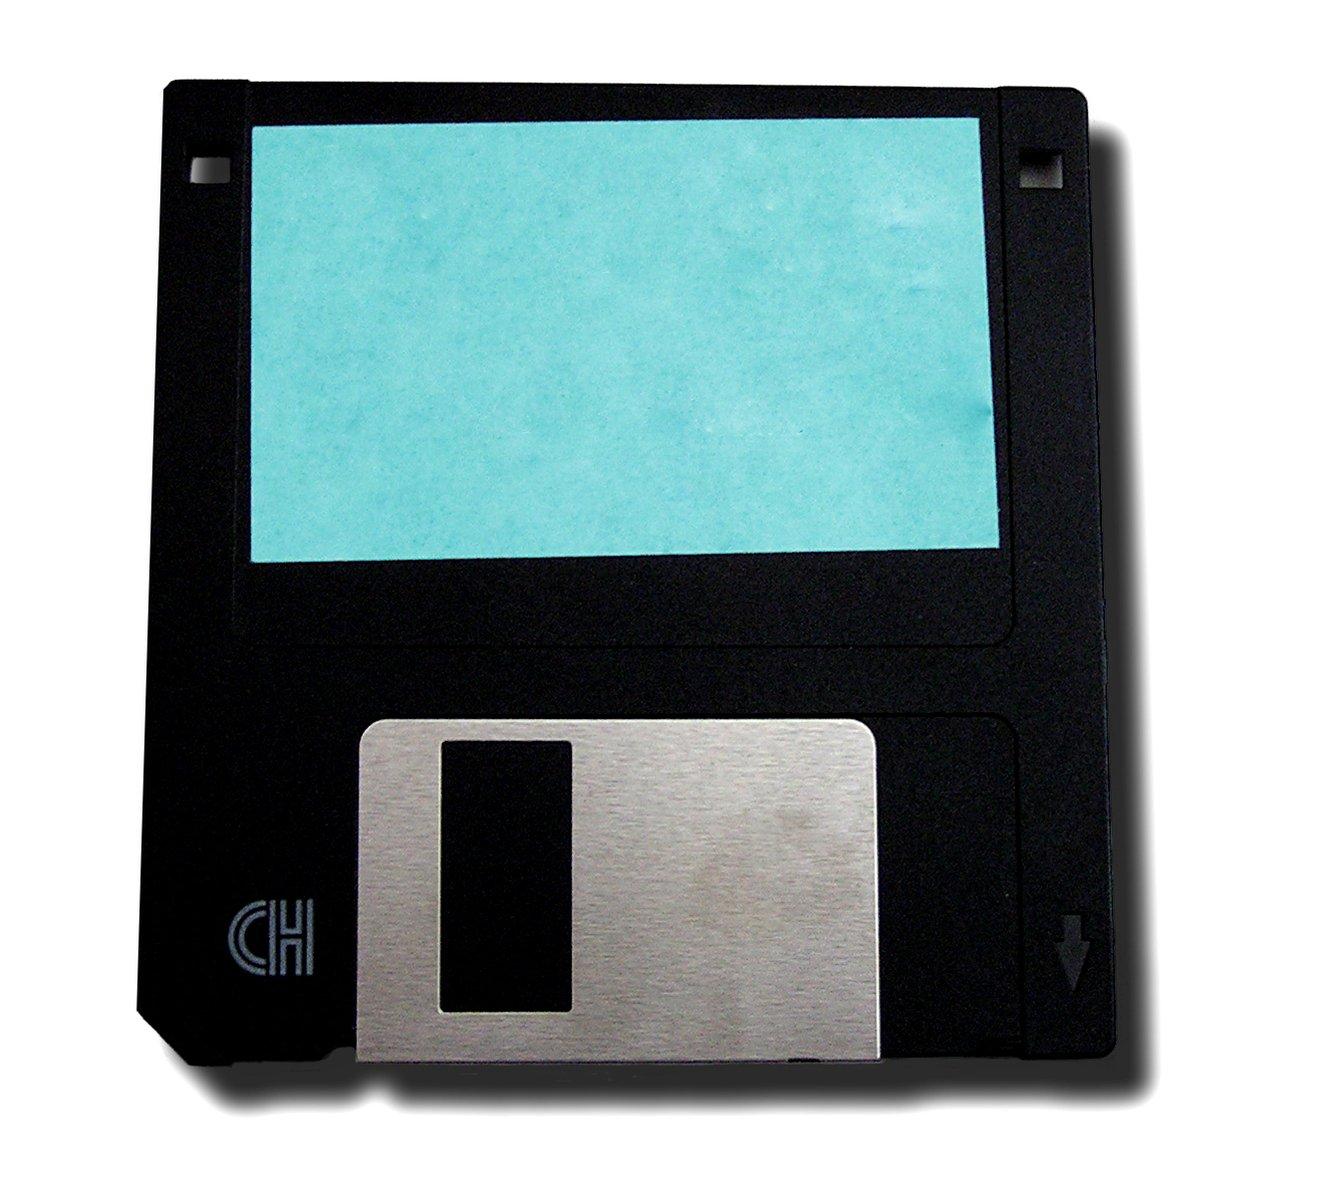 Floppy,floppy,disc,disk